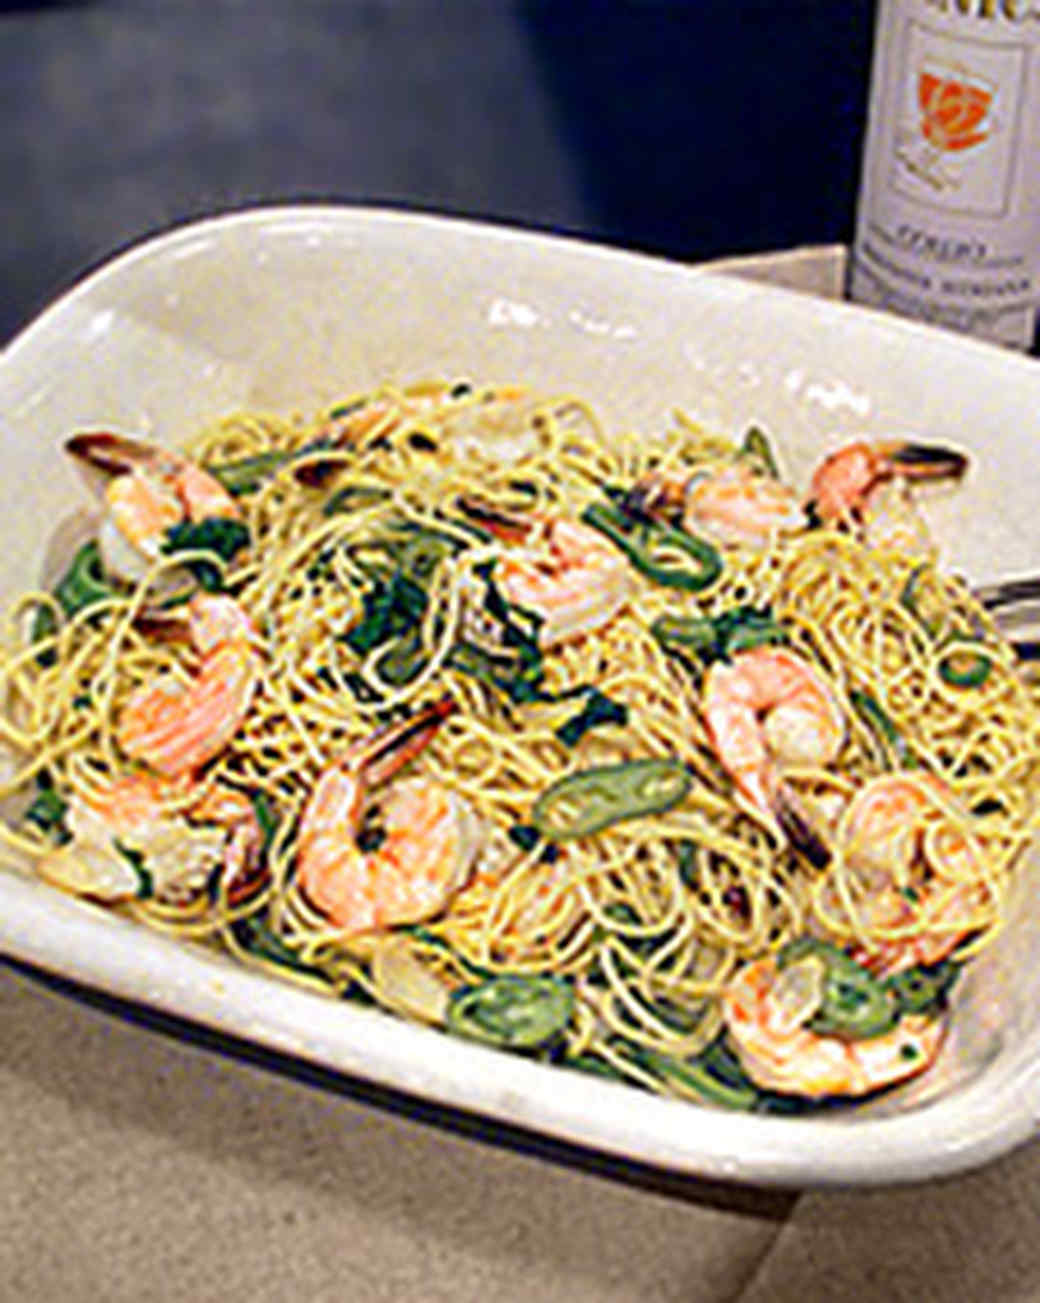 Spaghettini with Shrimp, Anaheim Chiles, and Arugula